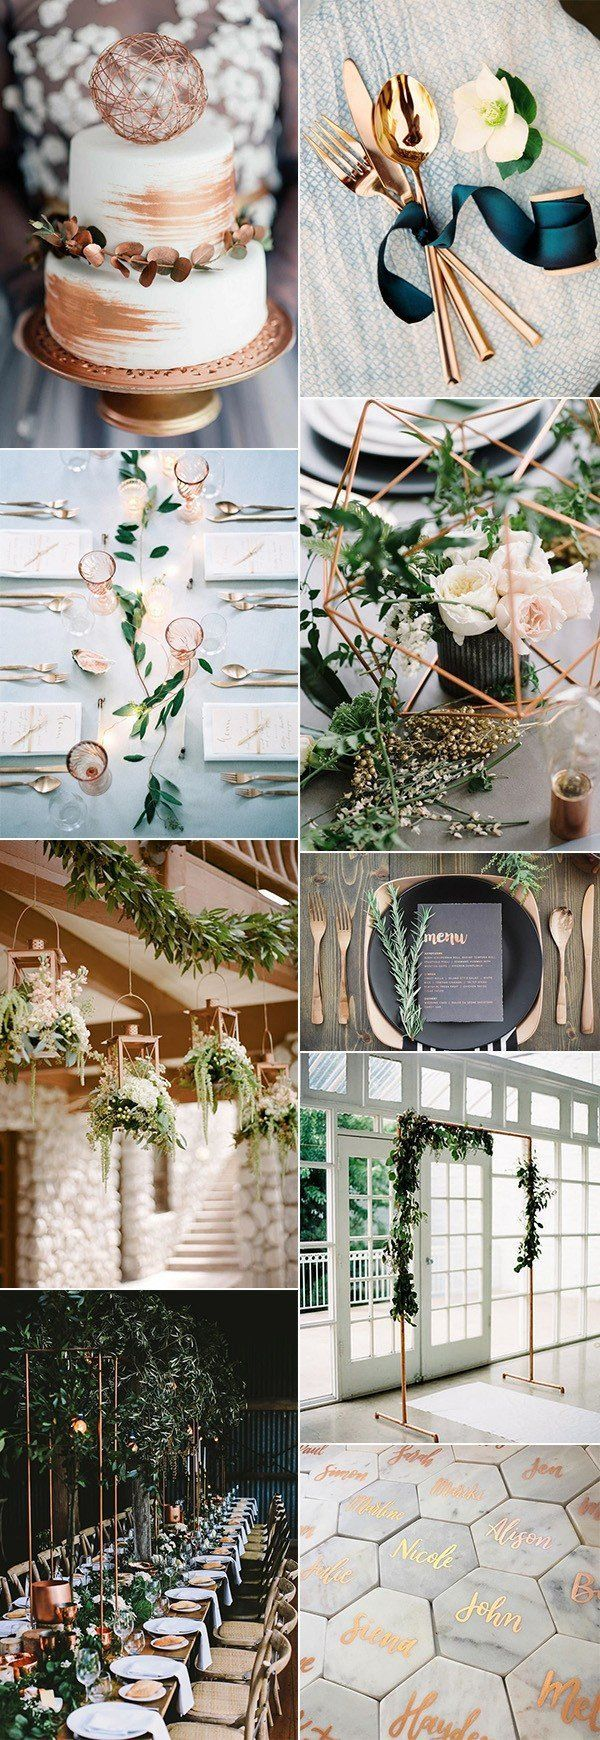 Trending-20 Metallic Bronze and Copper Wedding Color Ideas – Wedding Day Details